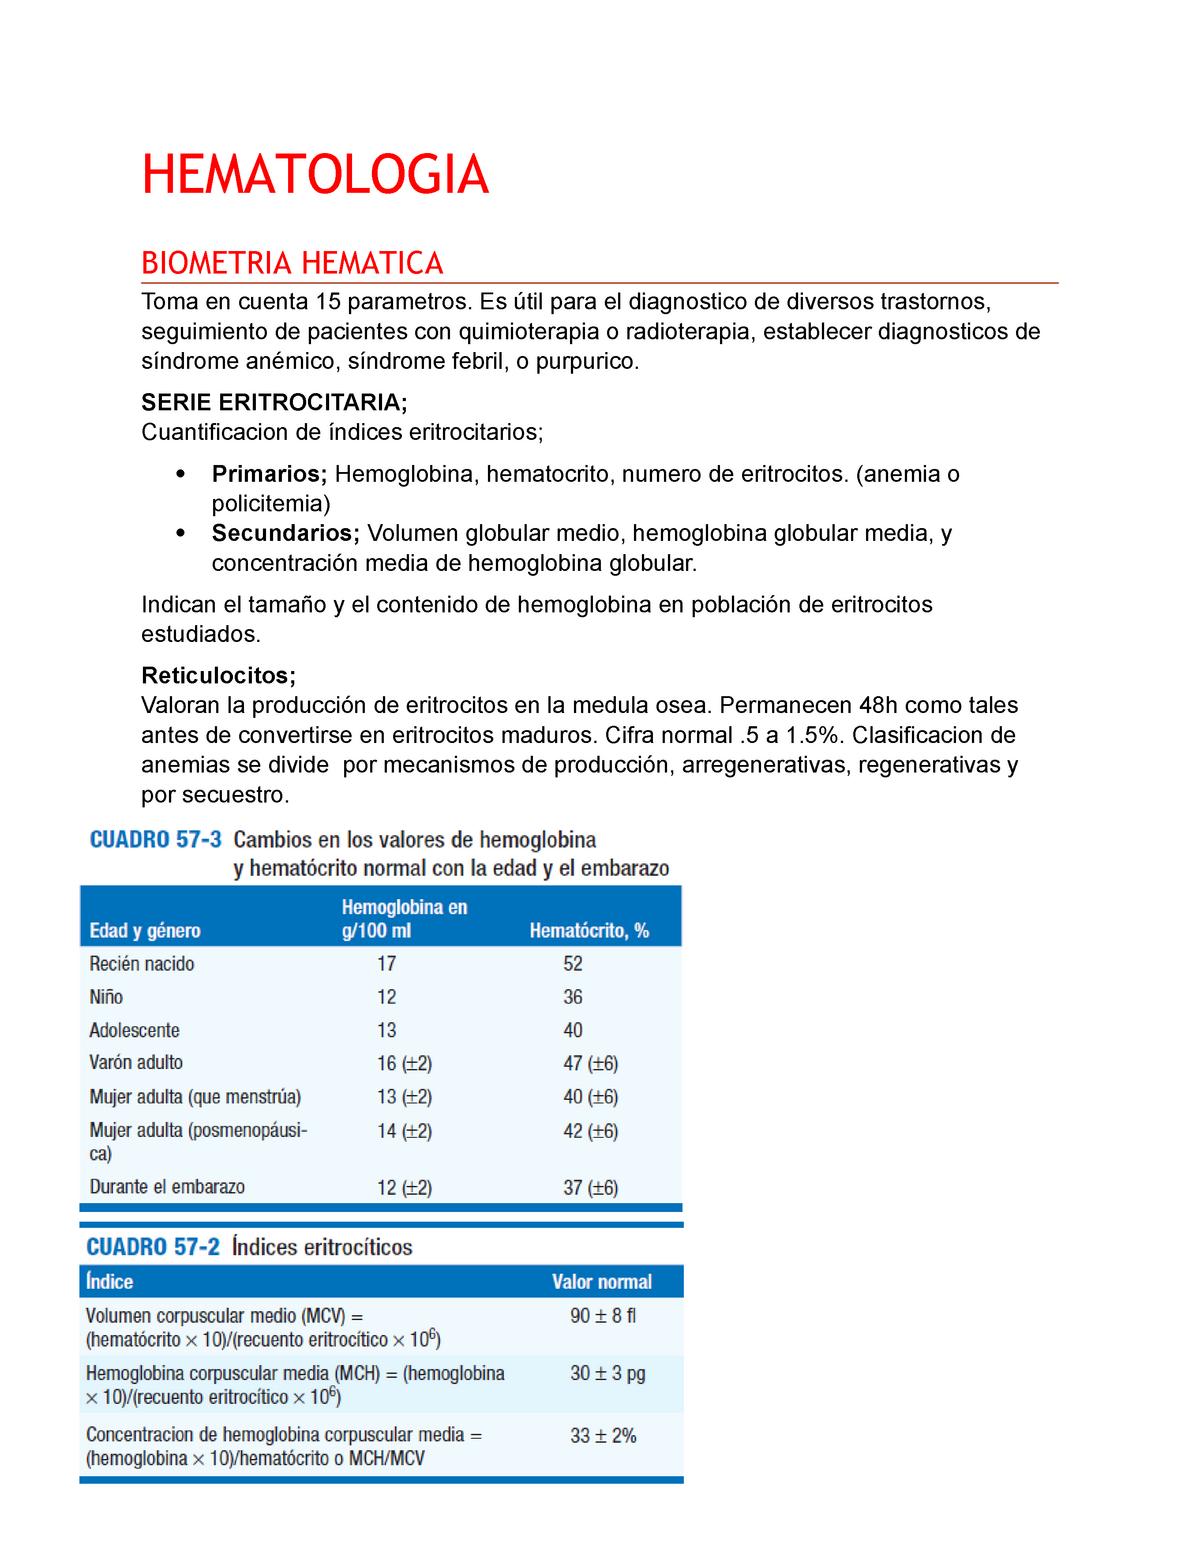 Valores Normales De Biometria Hematica Download